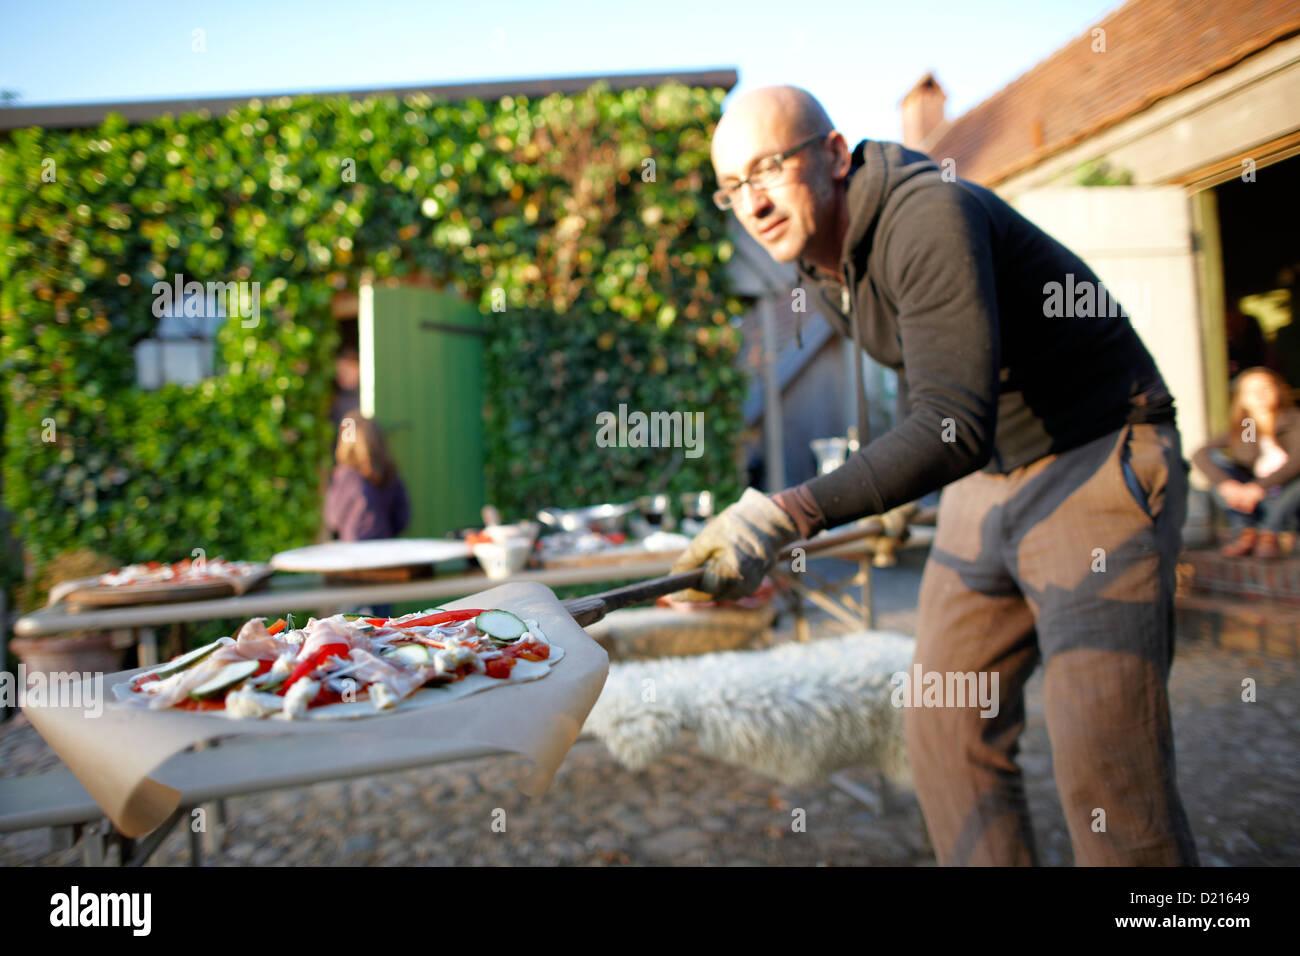 Man with pizza on a bread shovel, Klein Thurow, Roggendorf, Mecklenburg-Western Pomerania, Germany - Stock Image